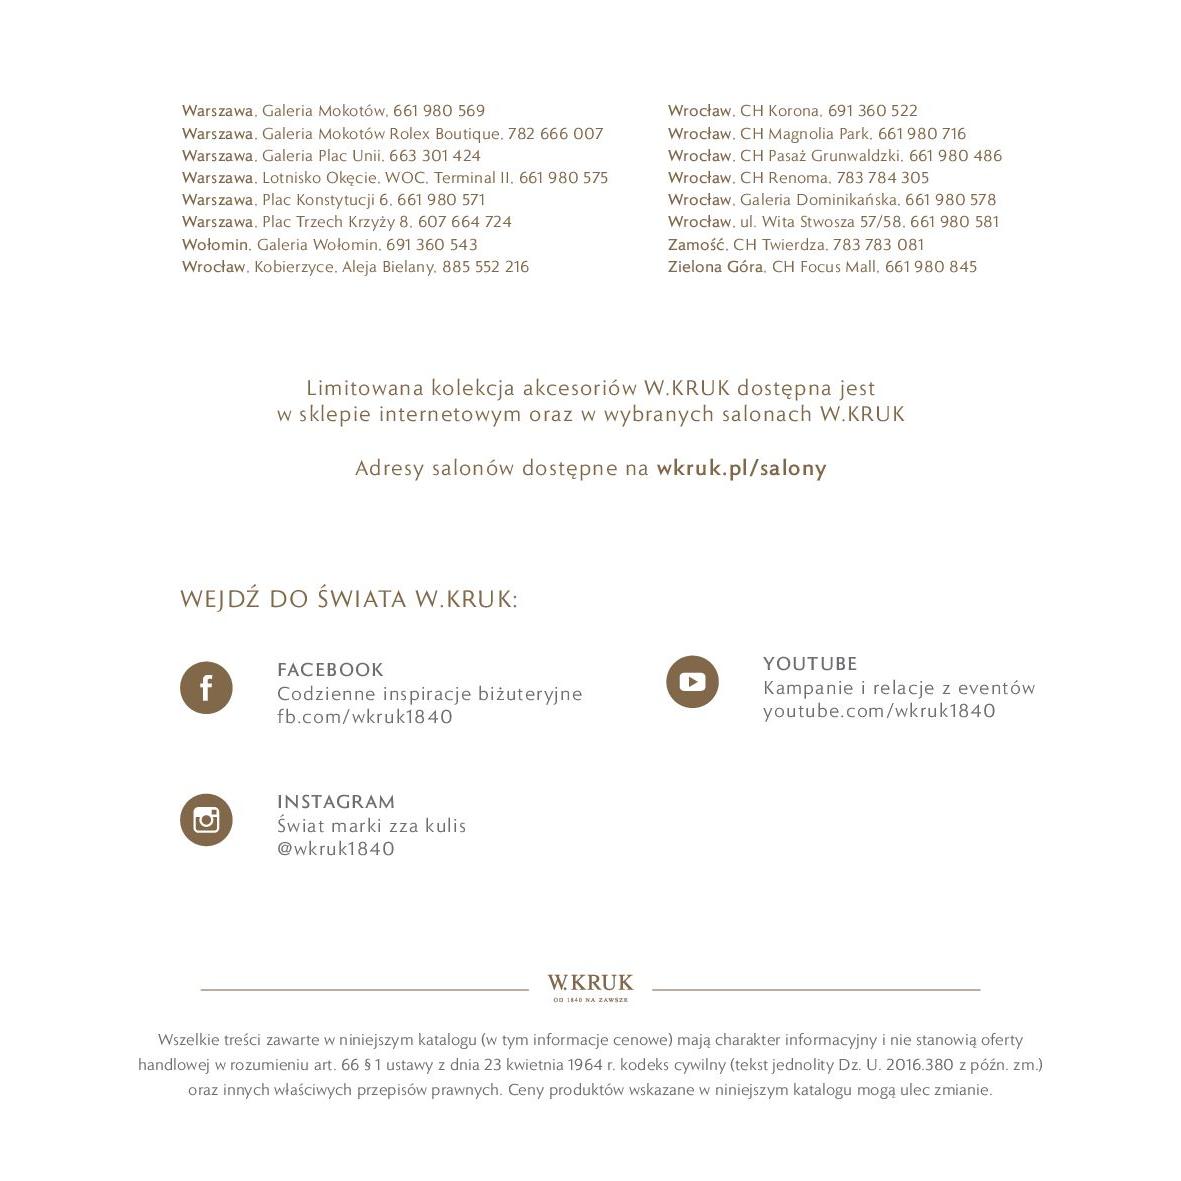 Gazetka W. KRUK: Katalog - Akcesoria 2021-02-17 page-91